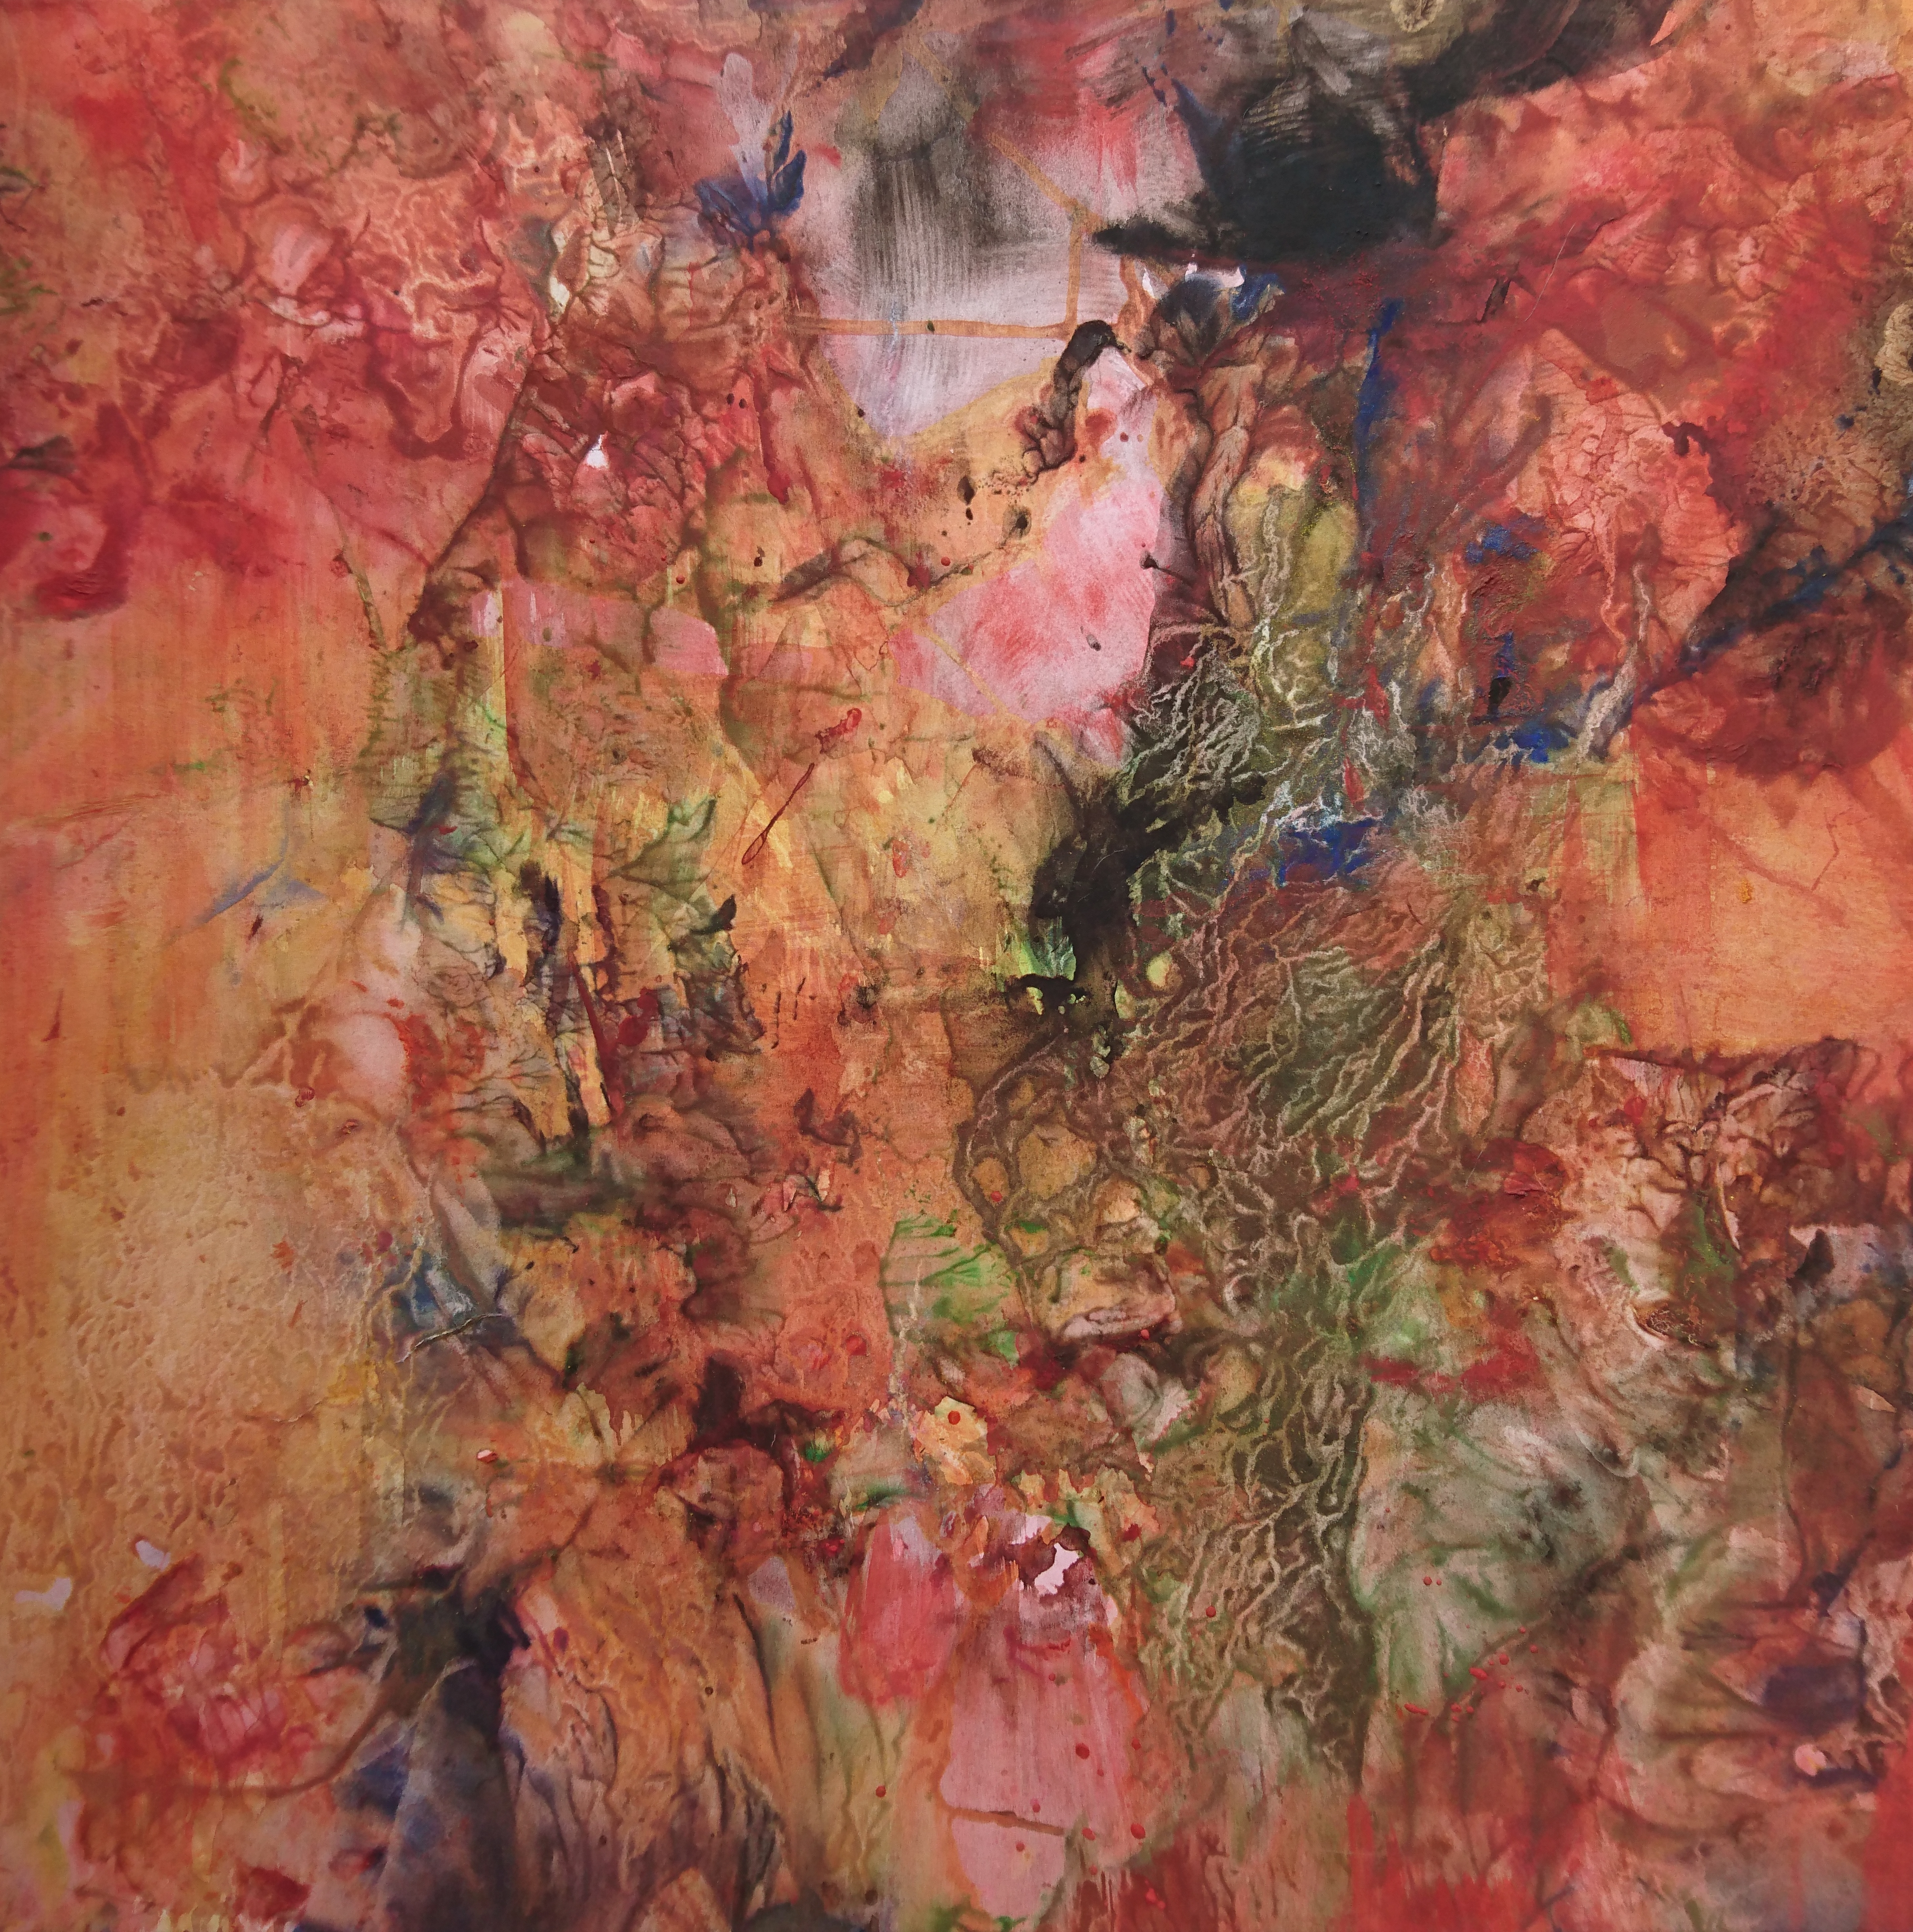 Yu Zhao, Jardin aux pivoines, tempera/paper/canvas, 50x50cm, 2017, private collection